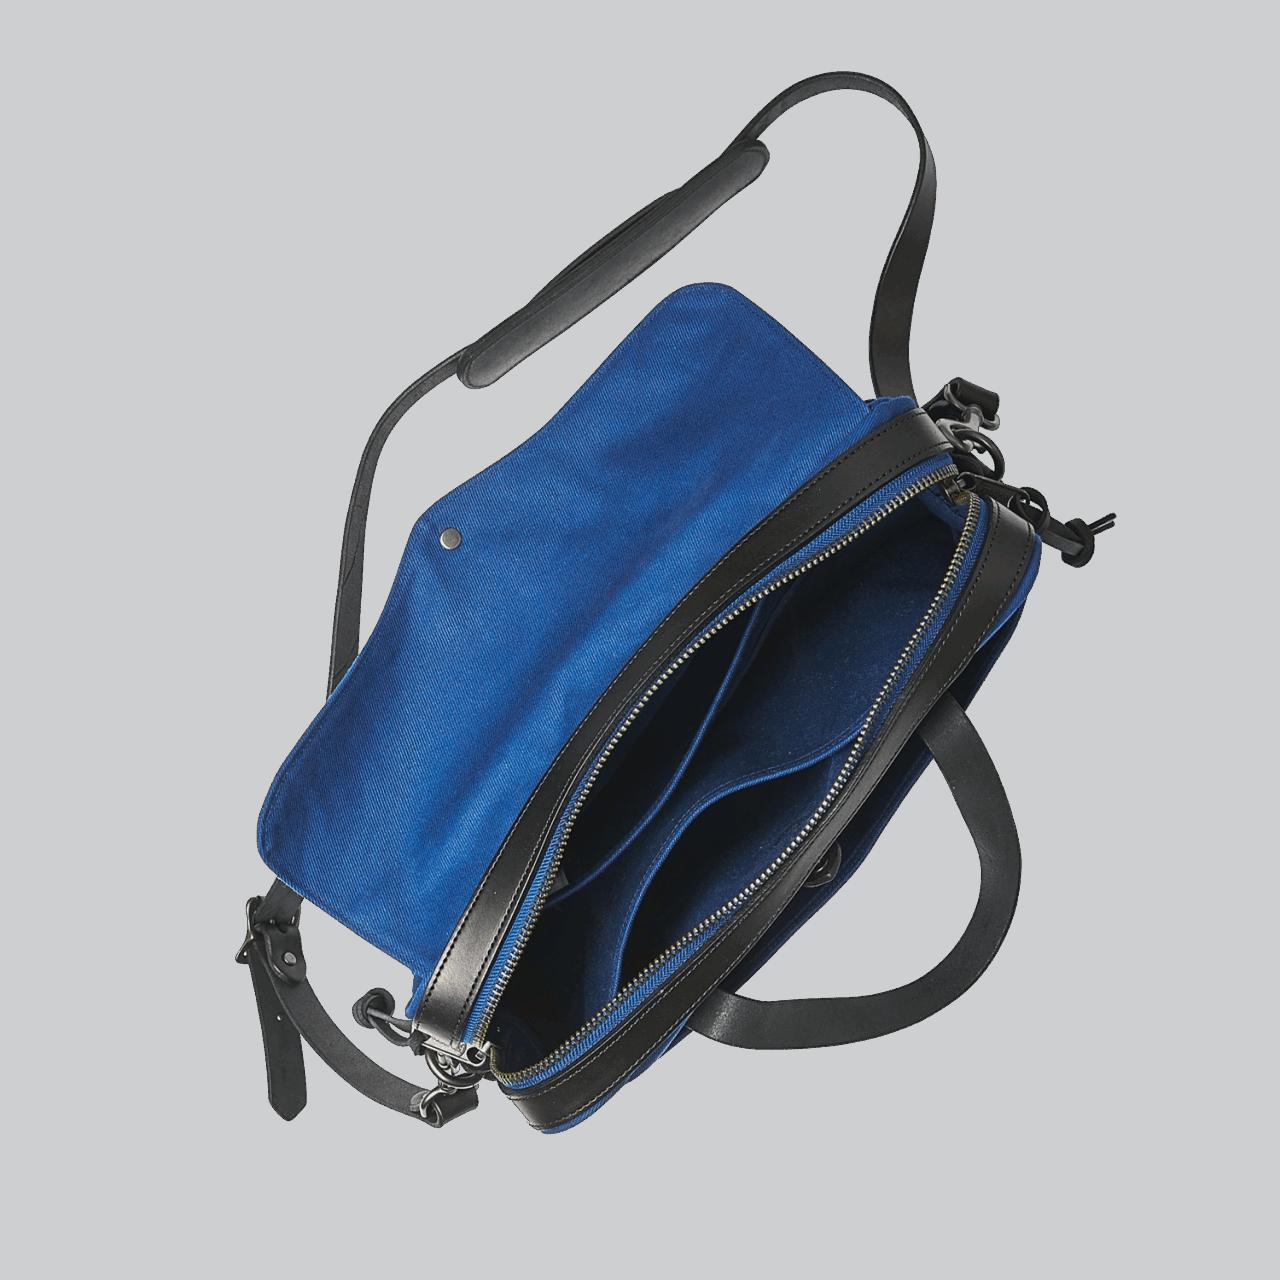 Filson Rugged Twill Original Briefcase - Flag Blue